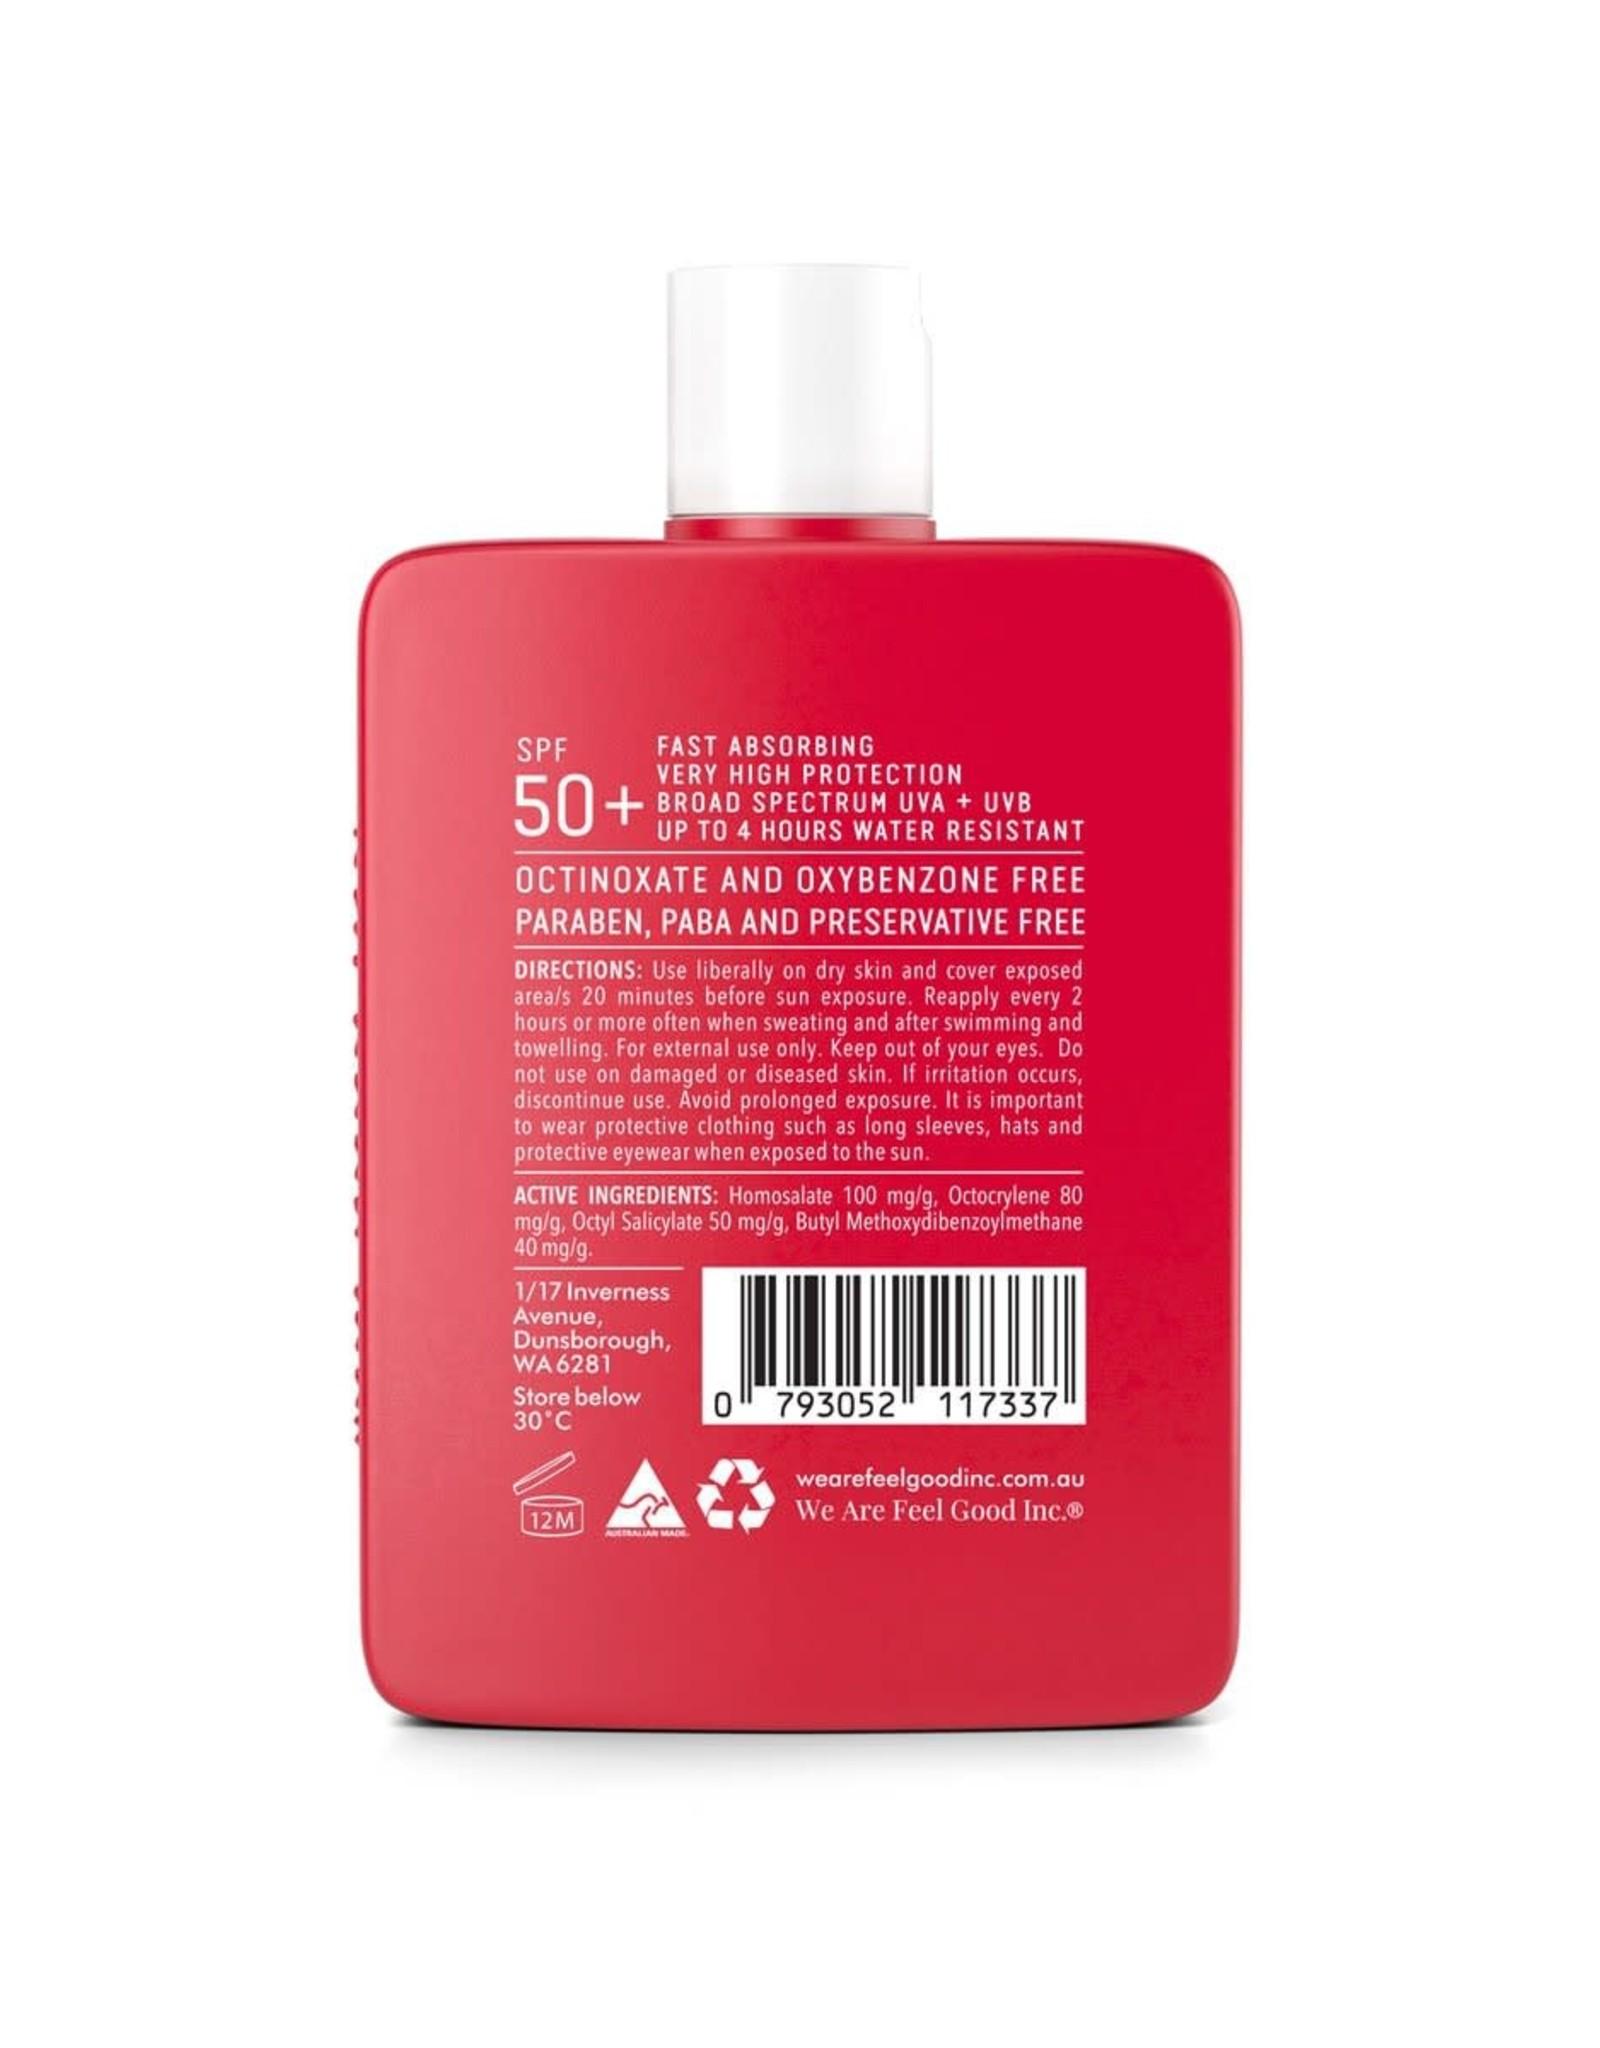 WE ARE FEEL GOOD INC Signature Sunscreen Lotion SPF 50+ 400ml